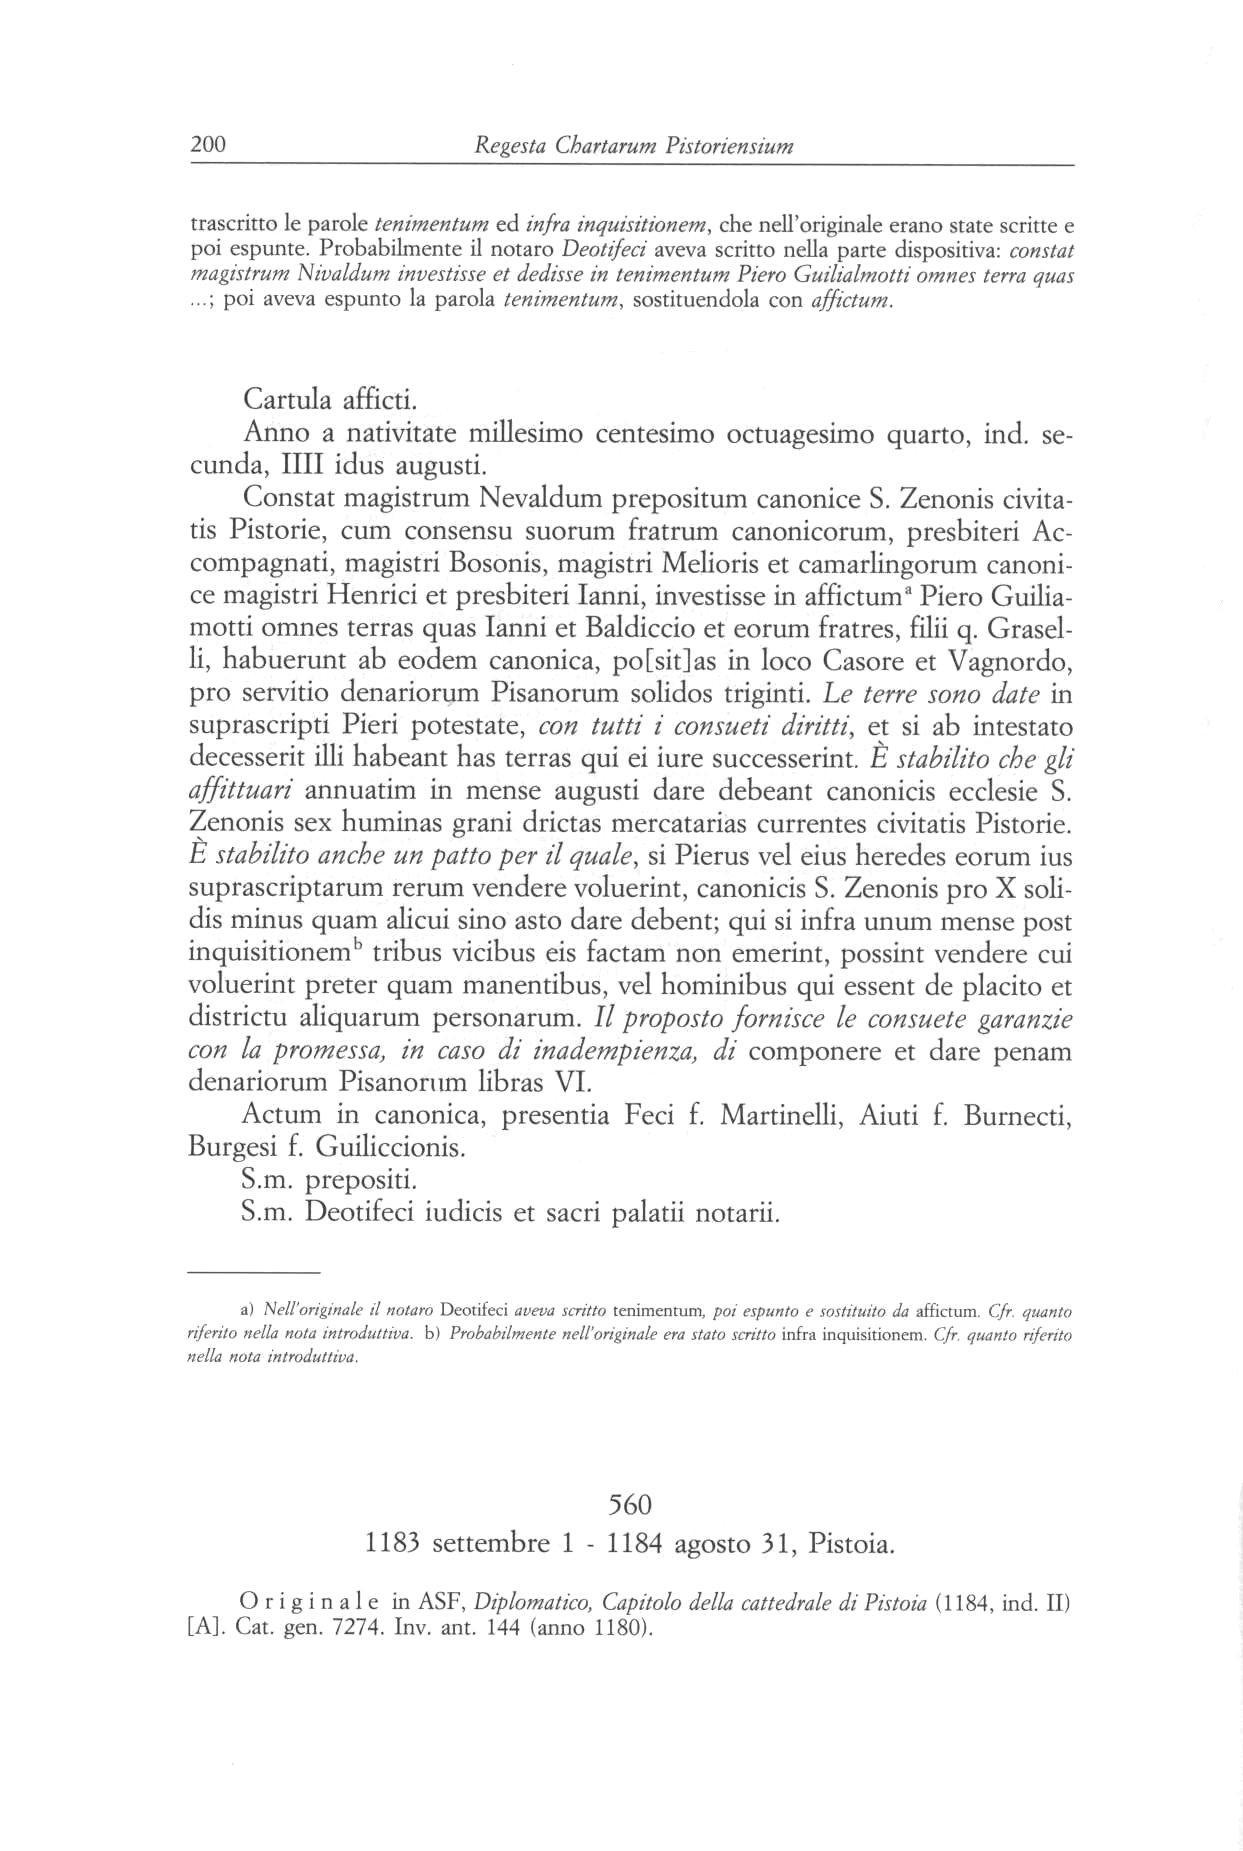 Canonica S. Zenone XII 0200.jpg